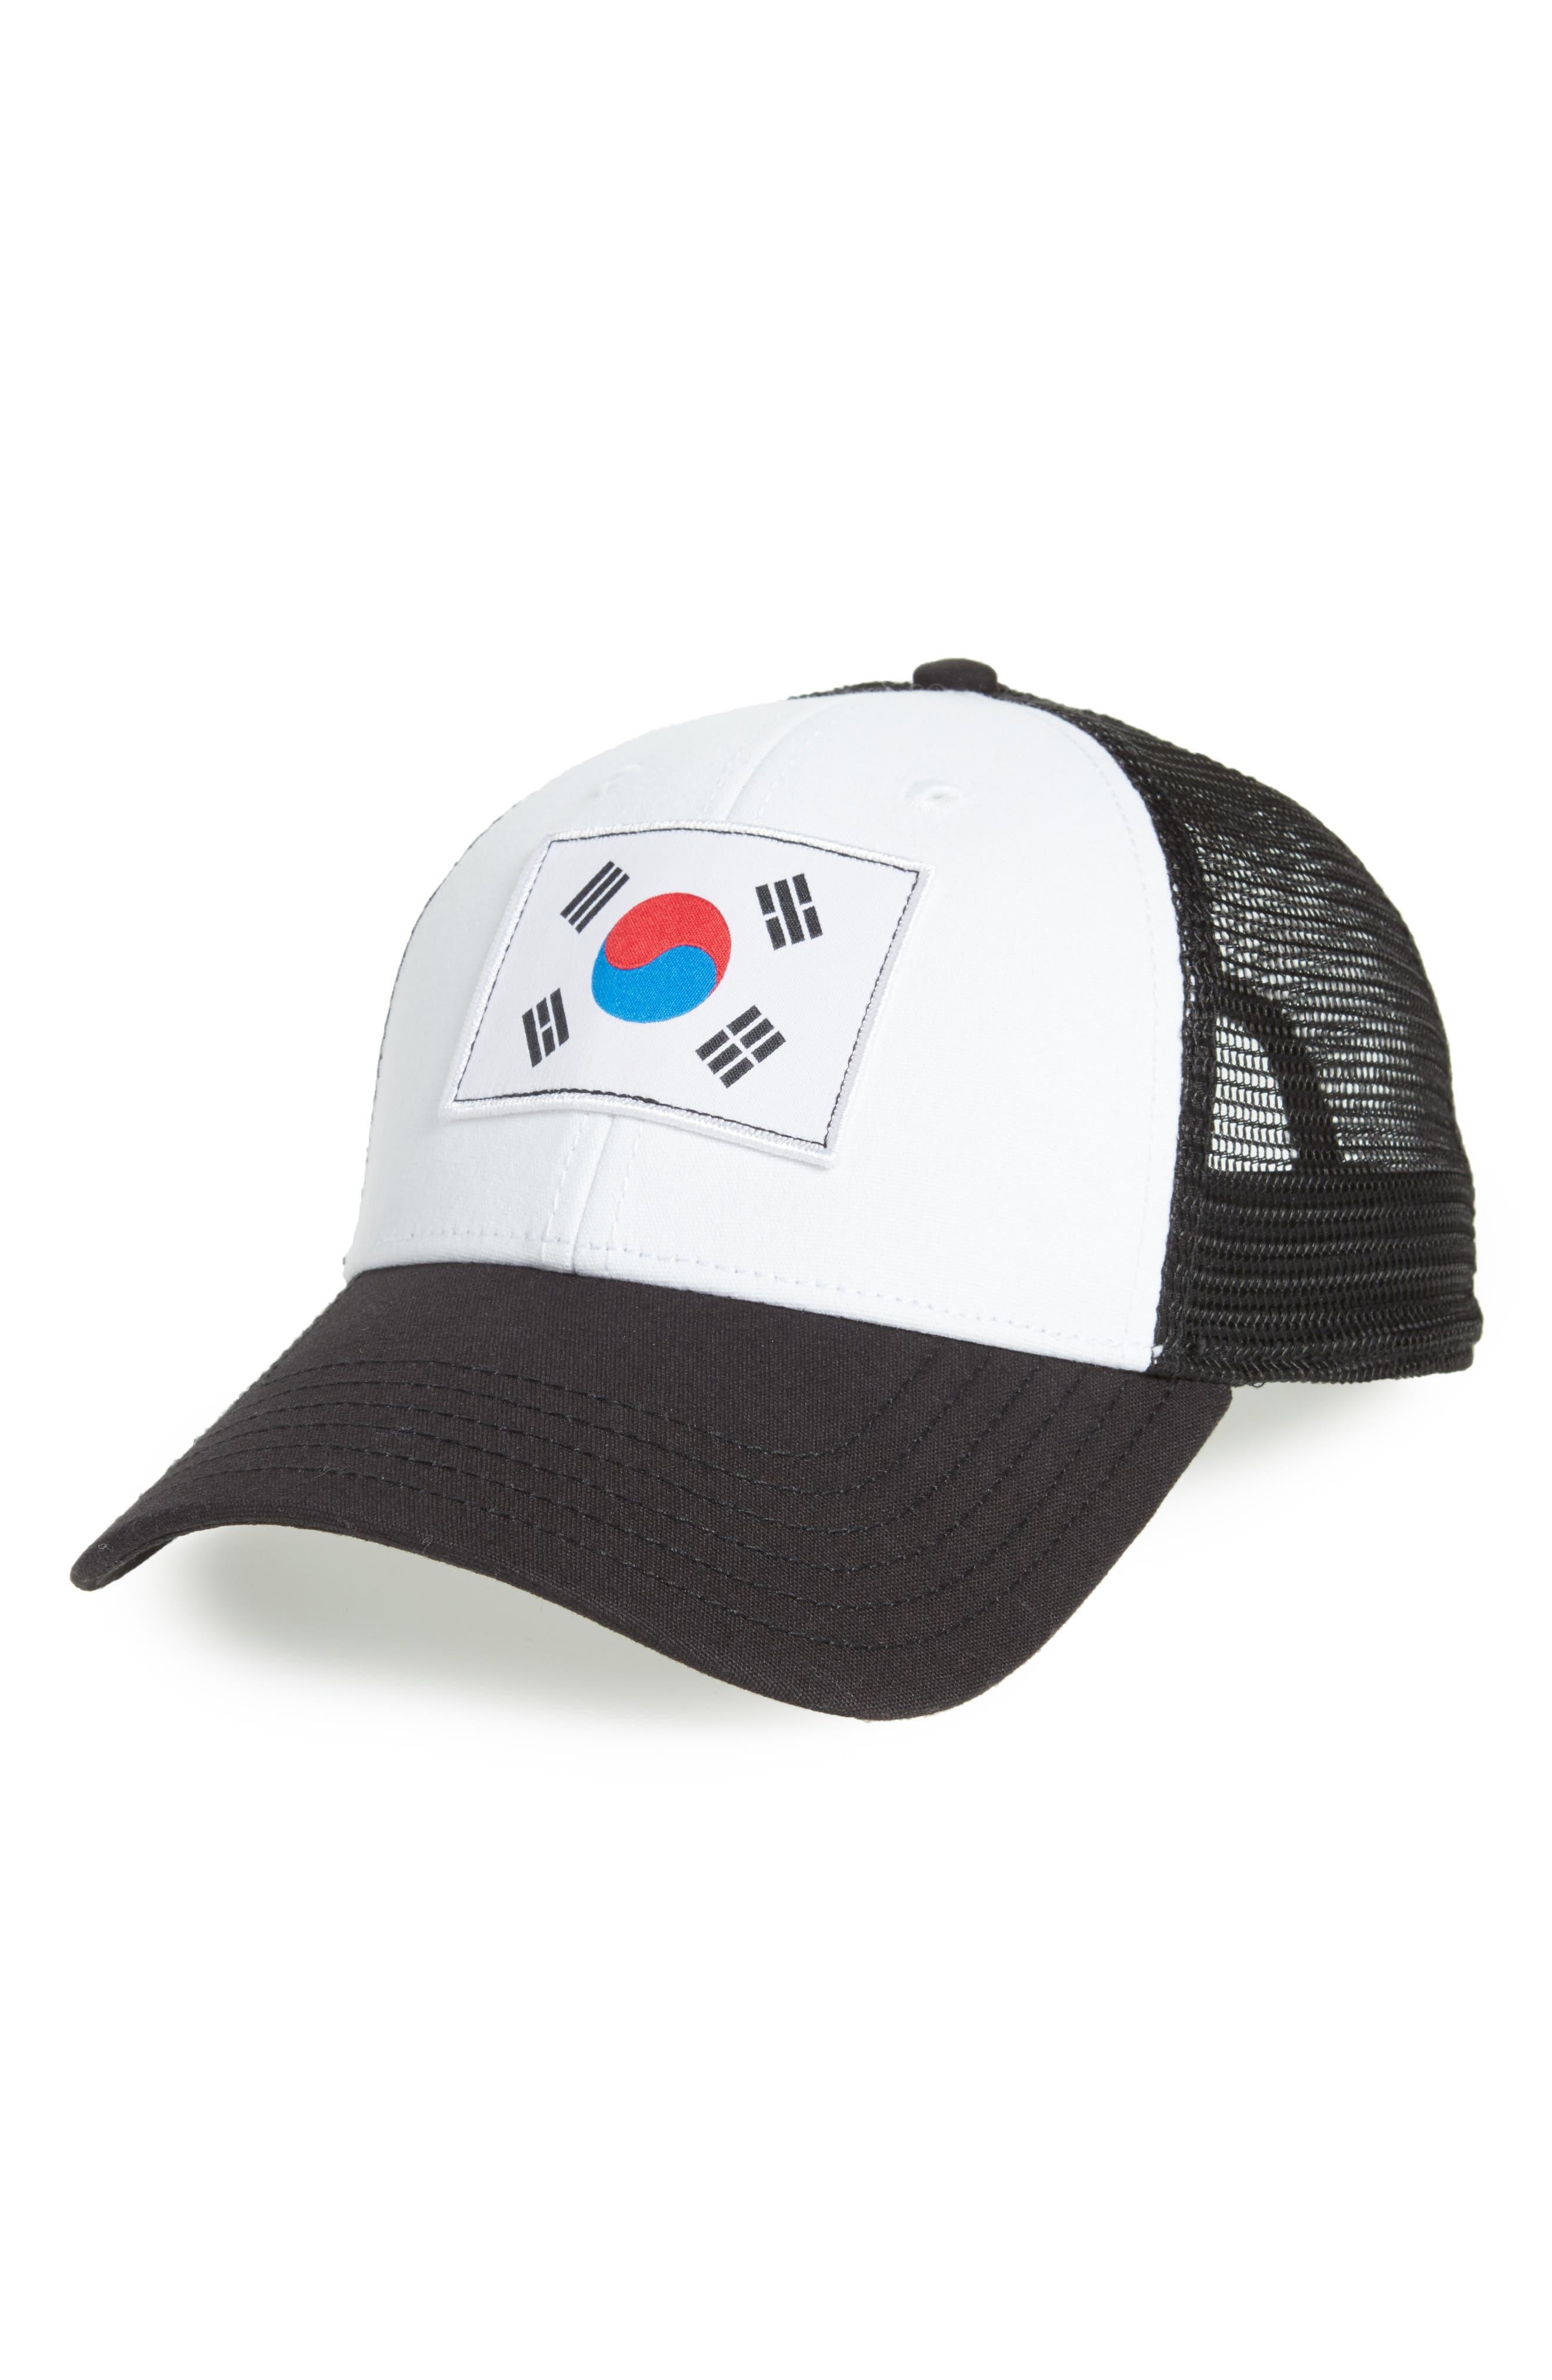 International Collection Baseball Cap,                         Main,                         color, Tnf White/ Tnf Black